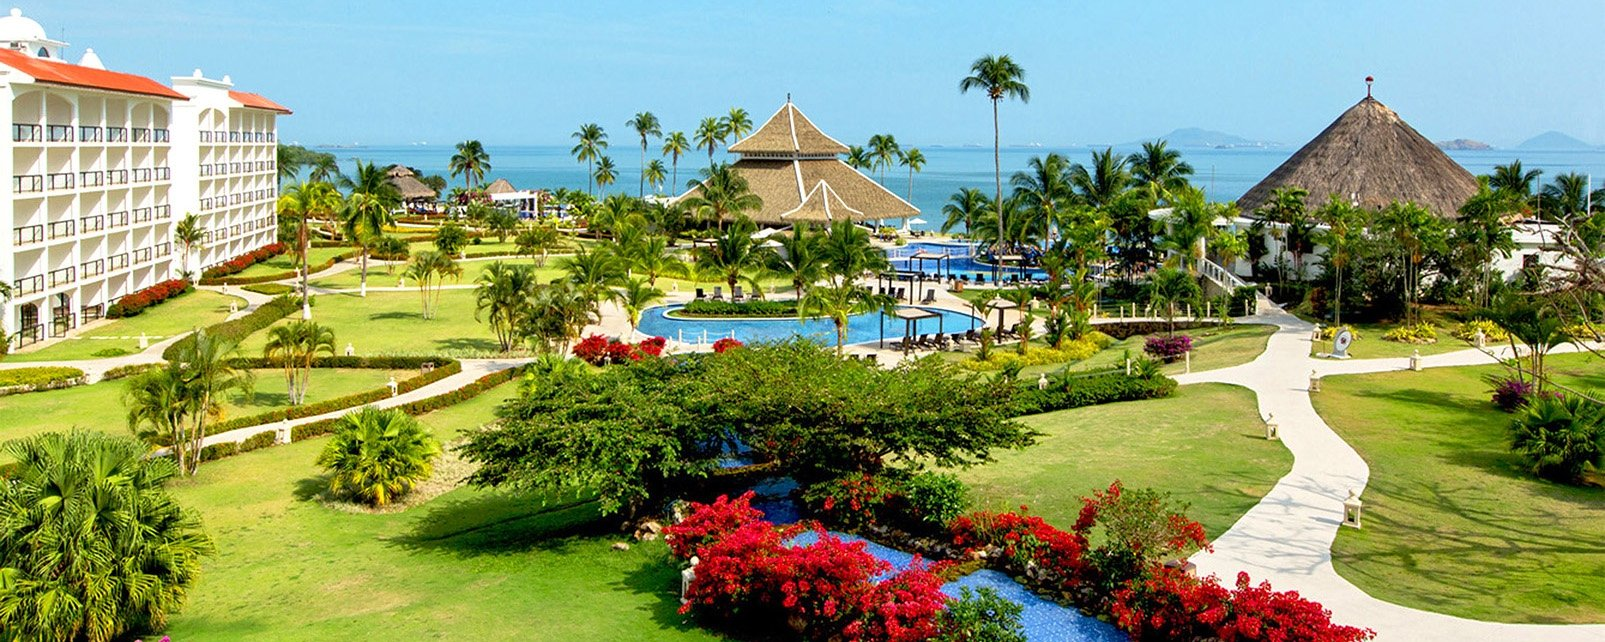 Kappa Club Dreams Delight Playa Bonita Panama 5*